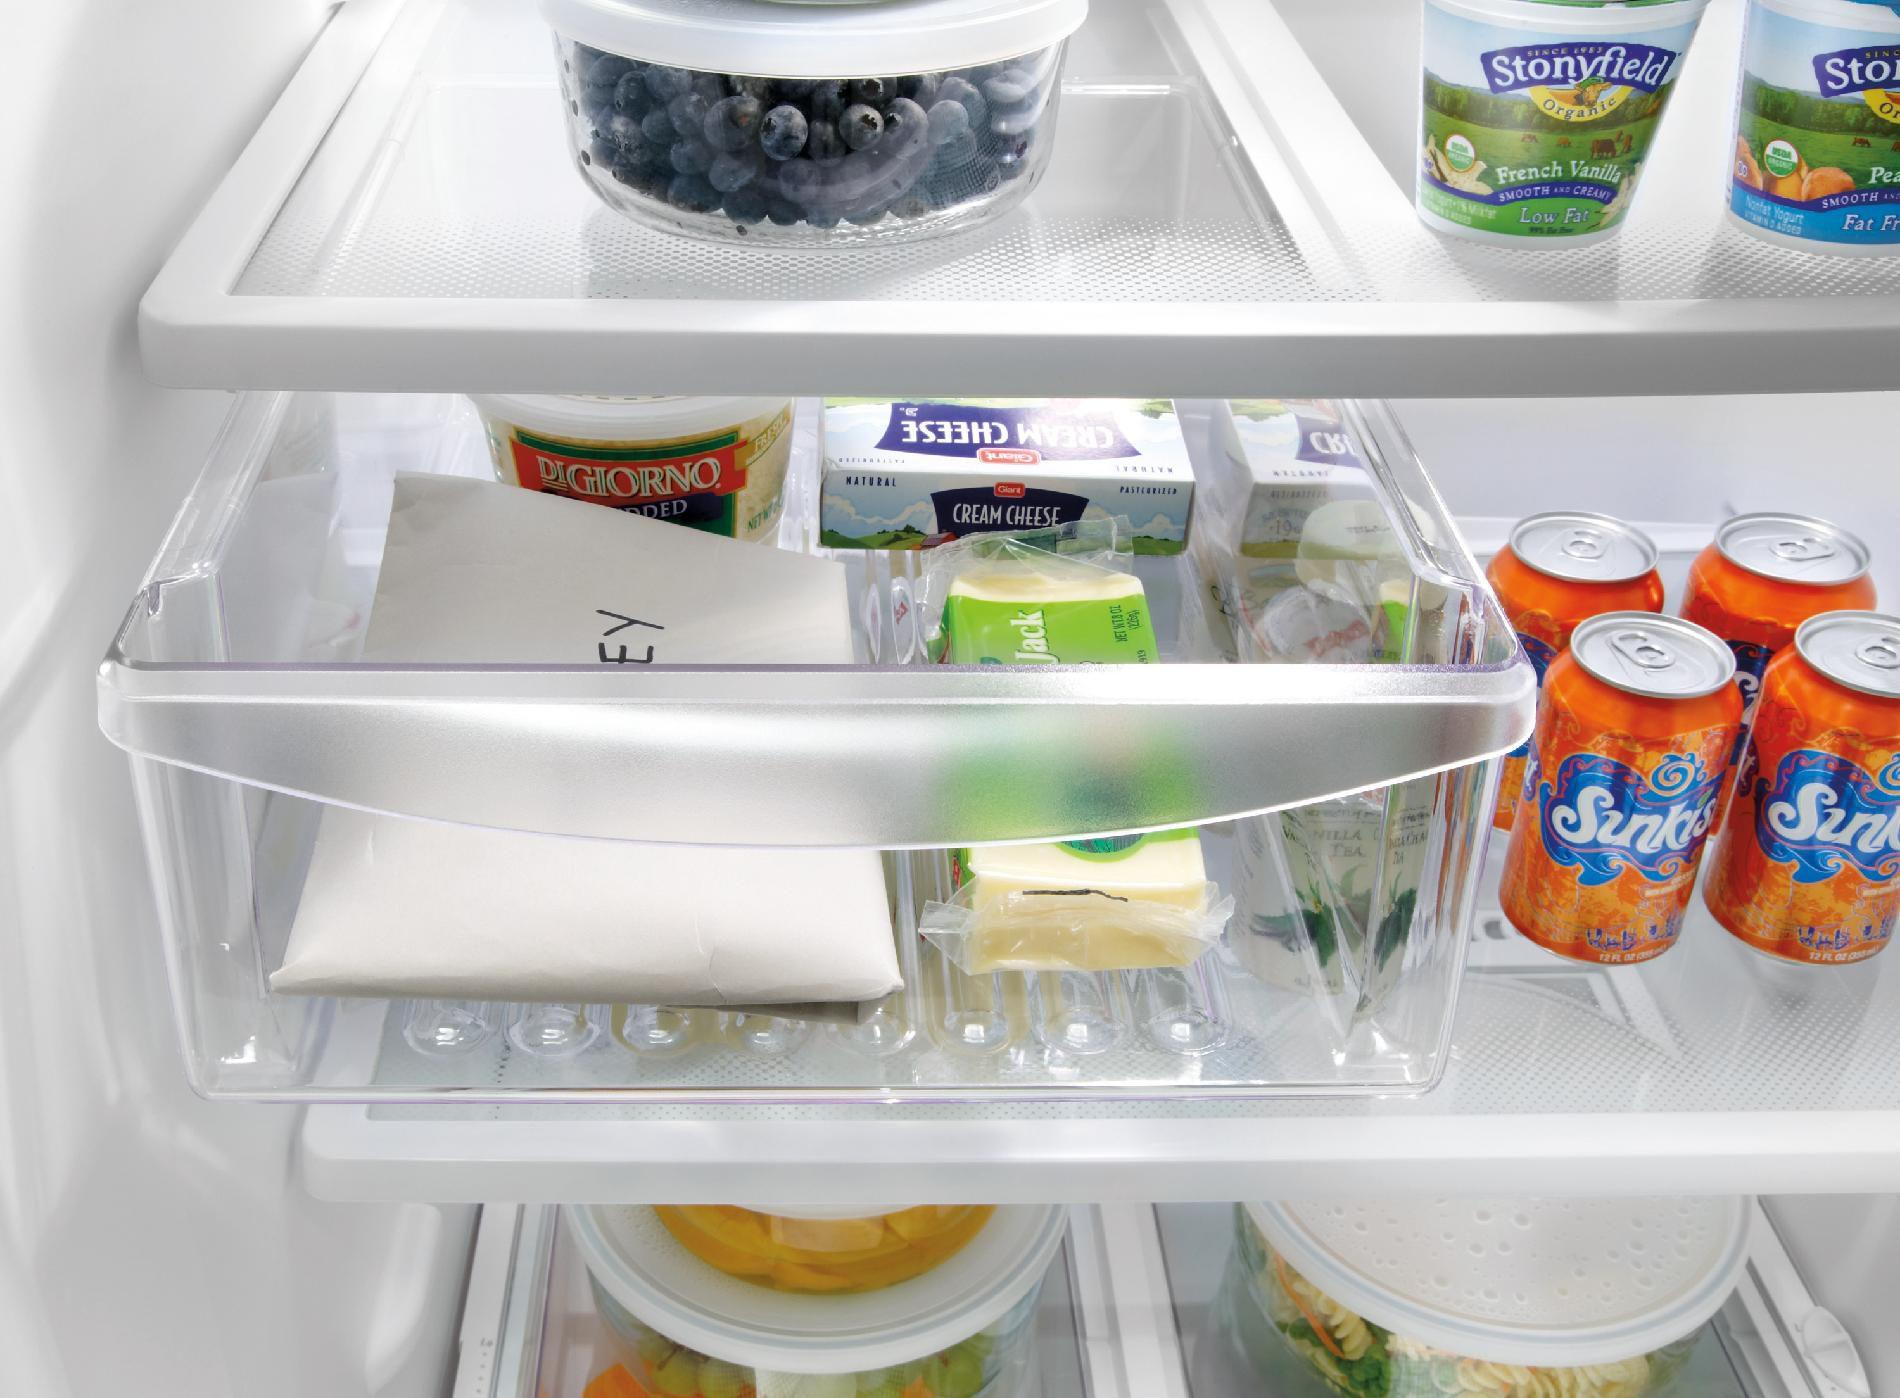 Frigidaire 18.2 cu. ft. Top Freezer Refrigerator - Stainless Steel